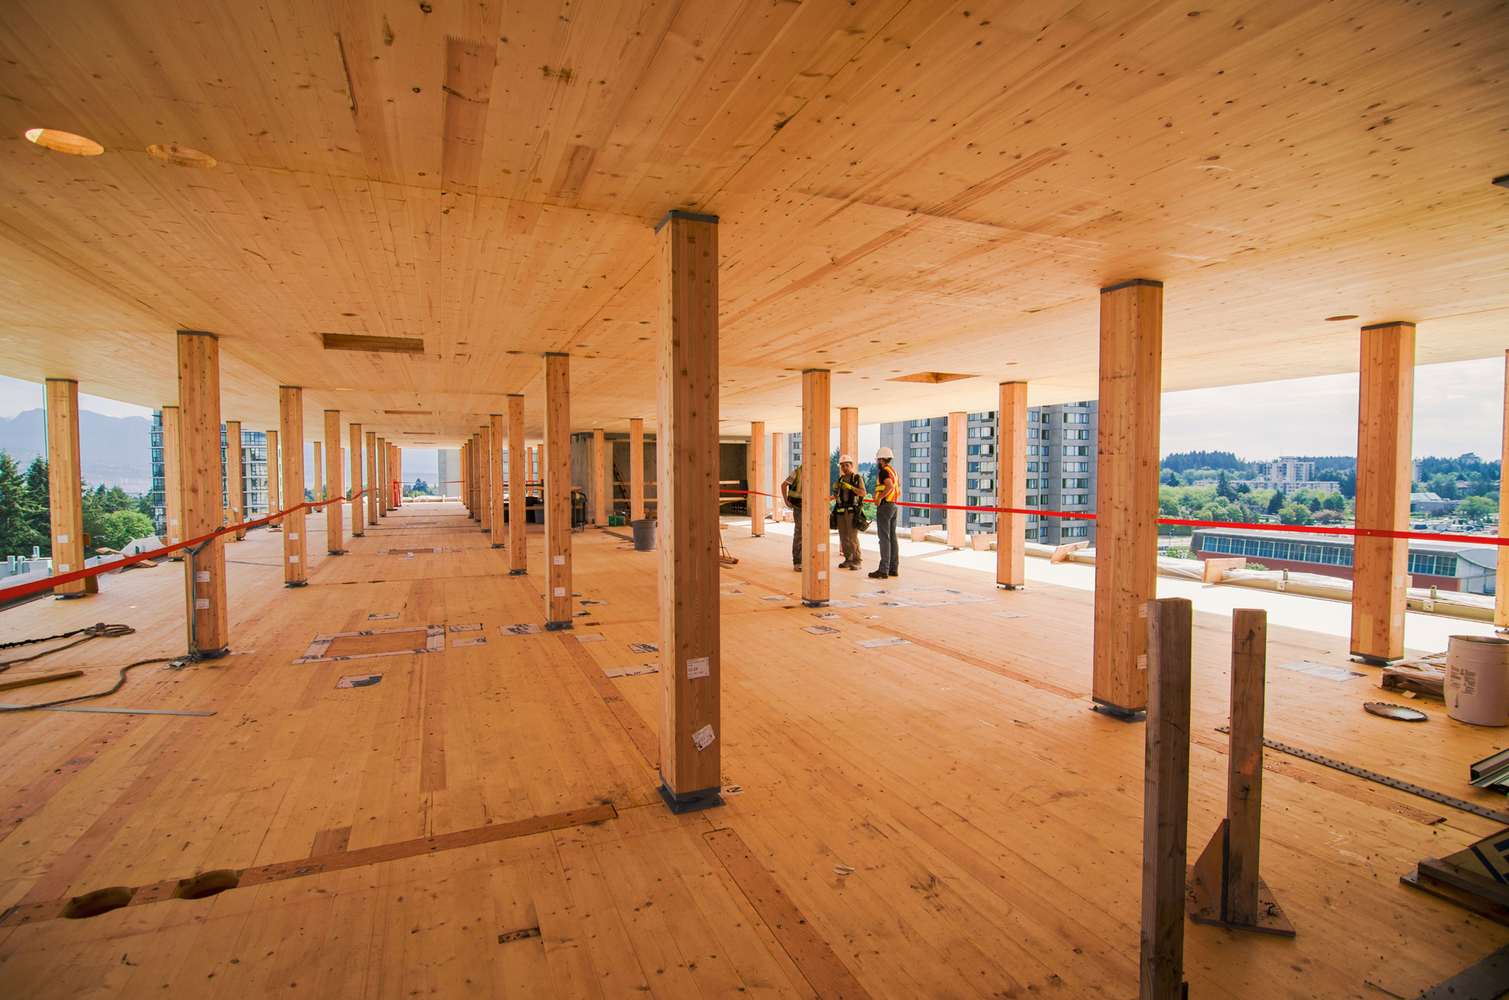 Тенденции развития лесоматериалов: 7 к 2020 году, дом TallWood в Brock Commons / Acton Ostry Architects и Hermann Kaufmann Architekten.  Image © Pollux Chung / предоставлено Seagate Structures